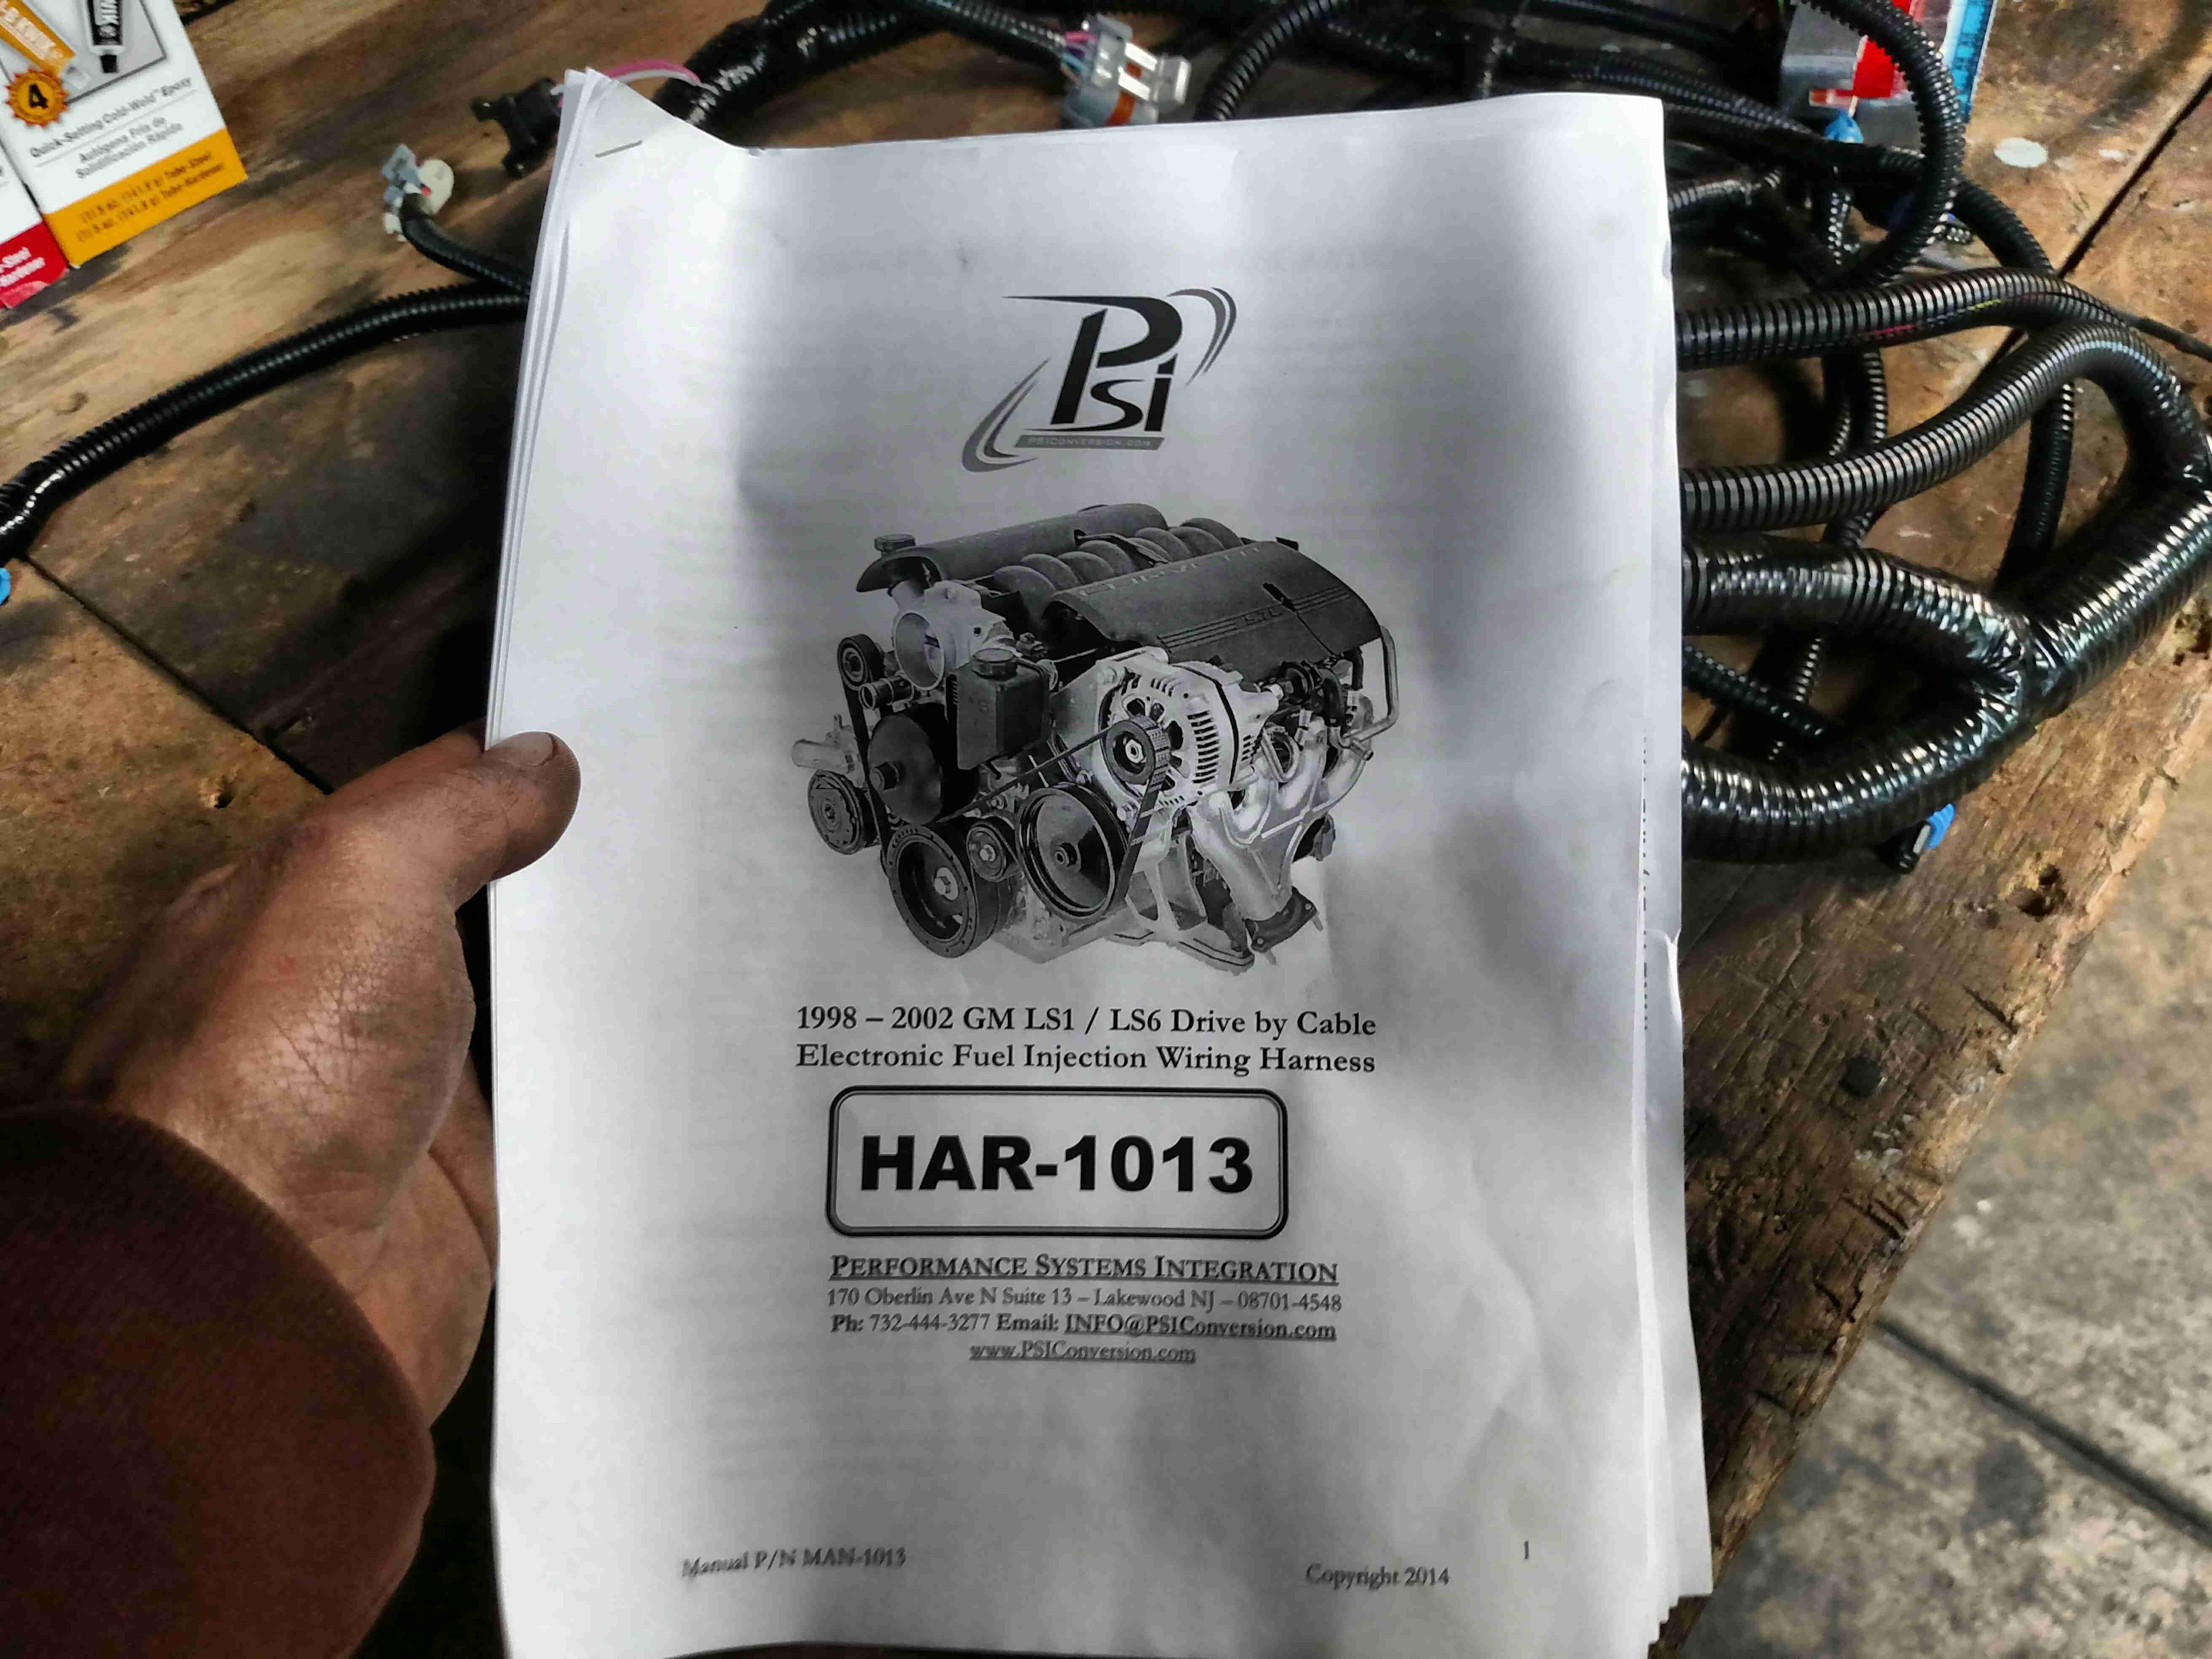 Psi Ls1 T56 Standalone Wiring Harness